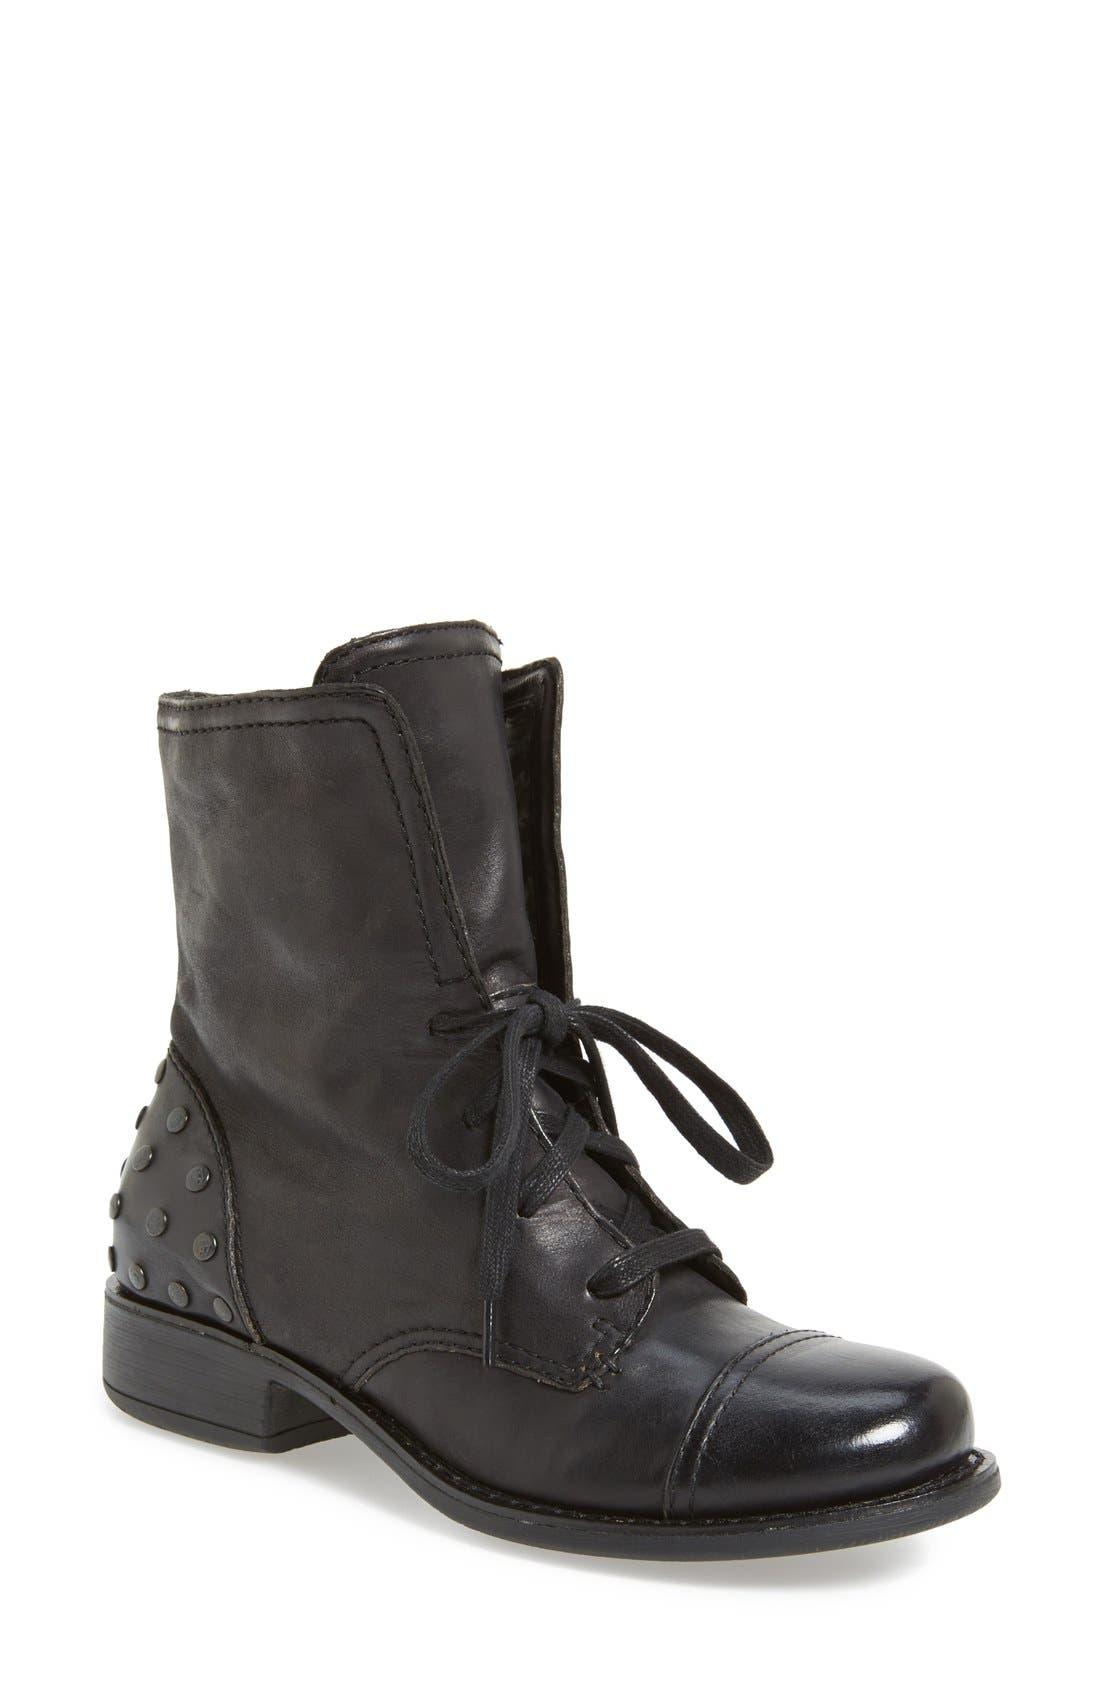 Main Image - OTBT 'Bridgeman' Cap Toe Leather Bootie (Women)